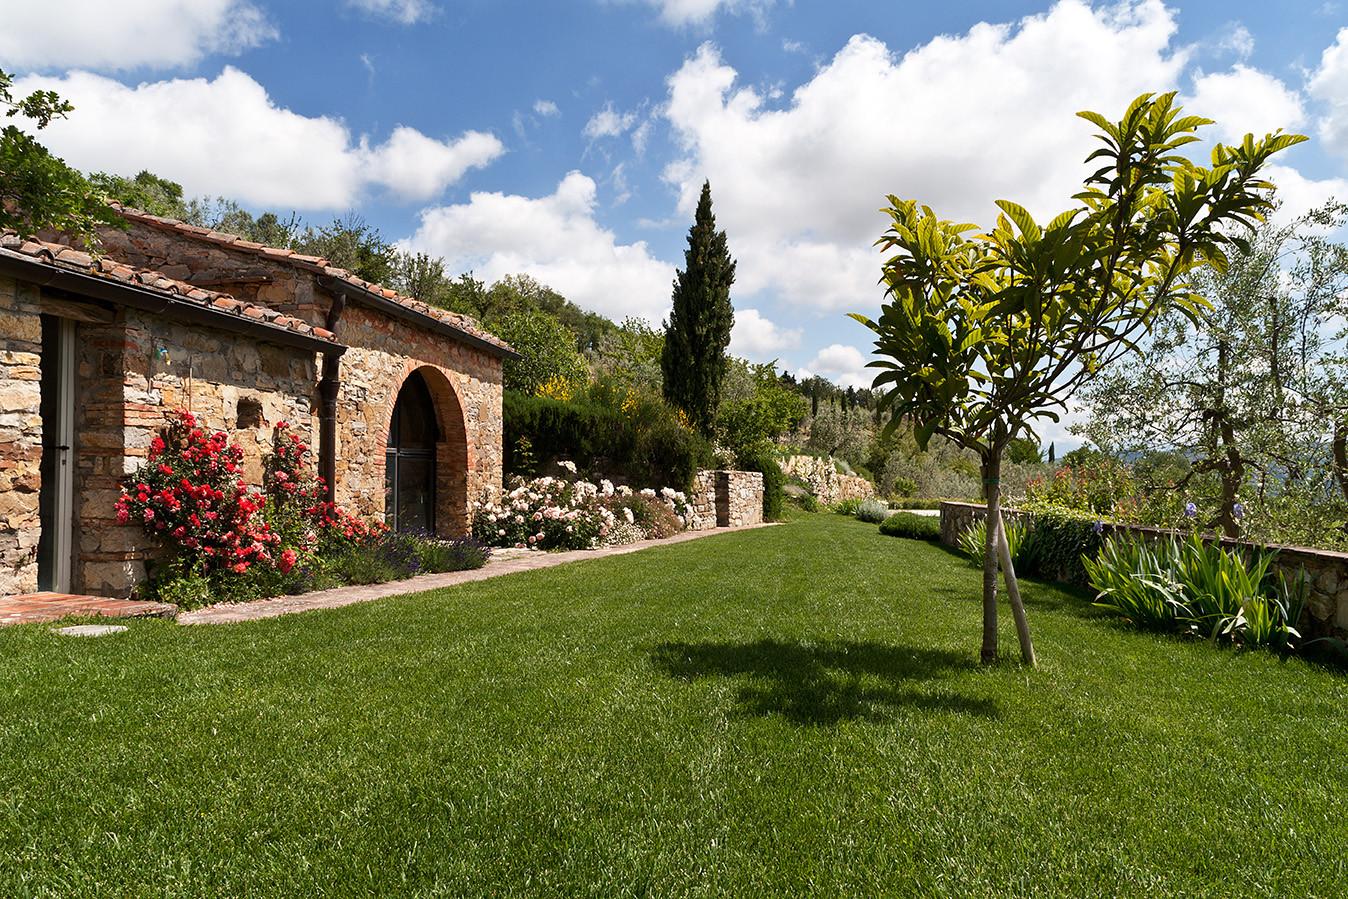 Annexe and garden looking east